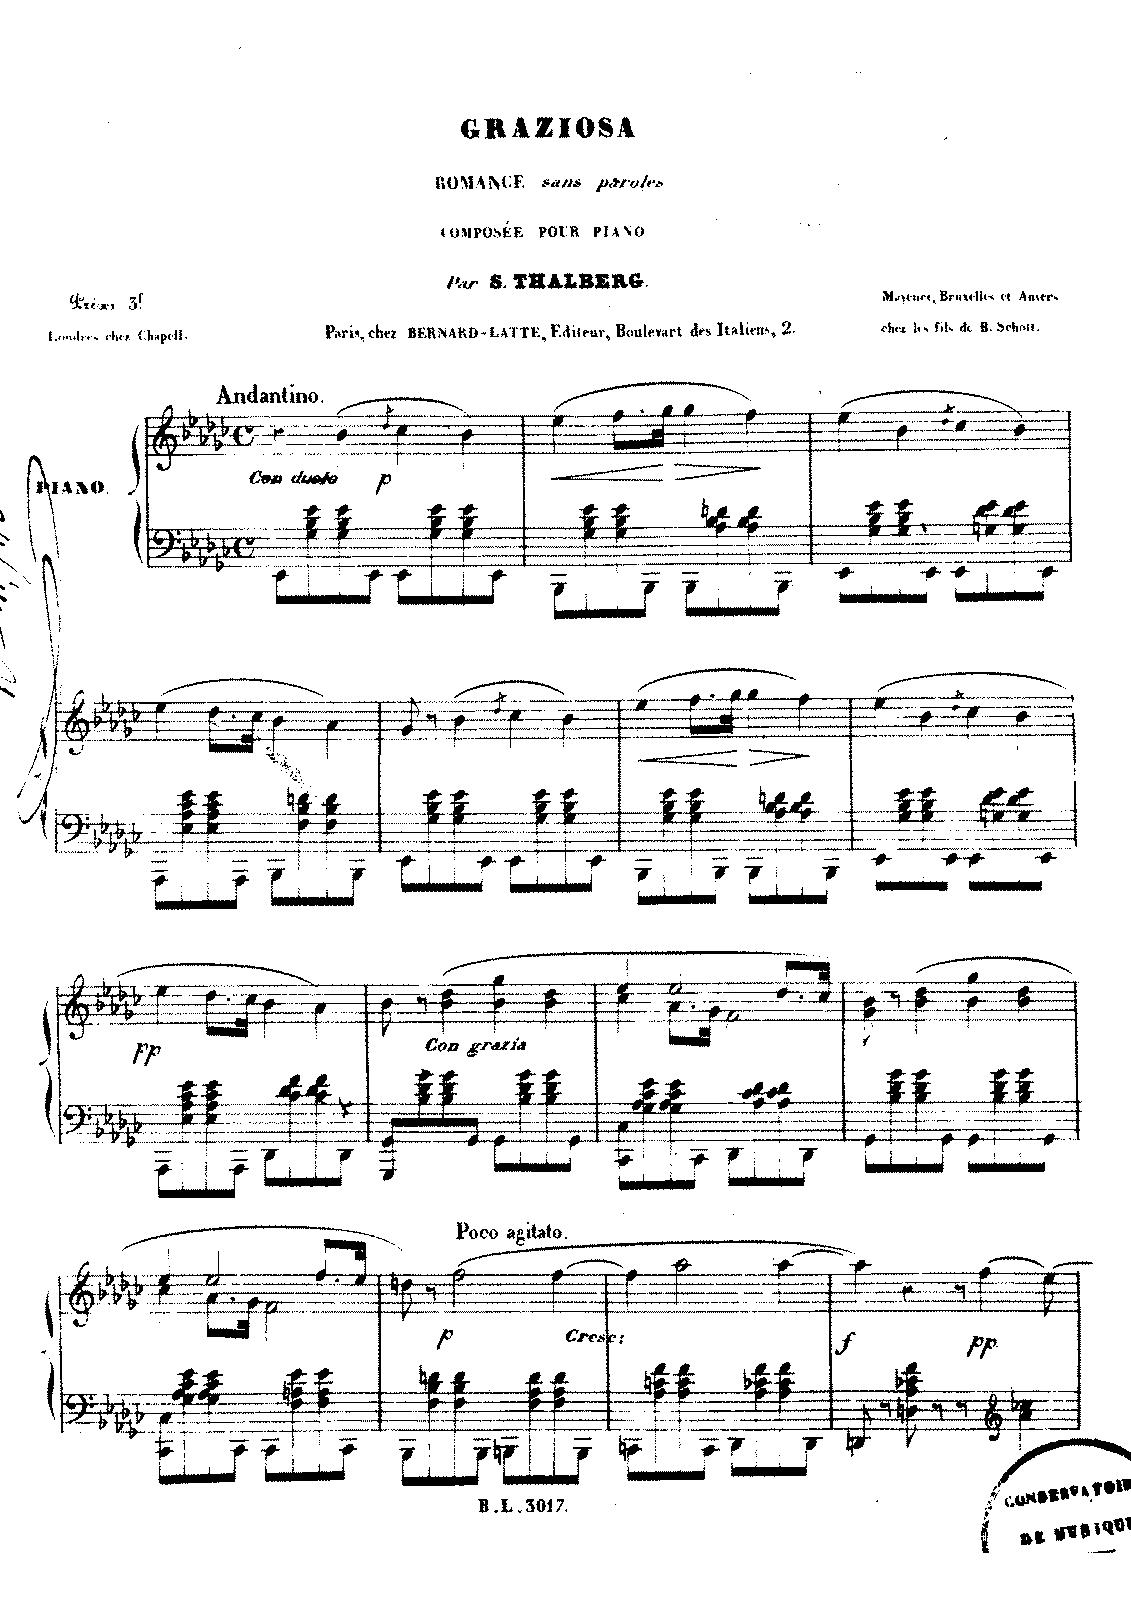 Graziosa (Thalberg, Sigismond) - IMSLP/Petrucci Music